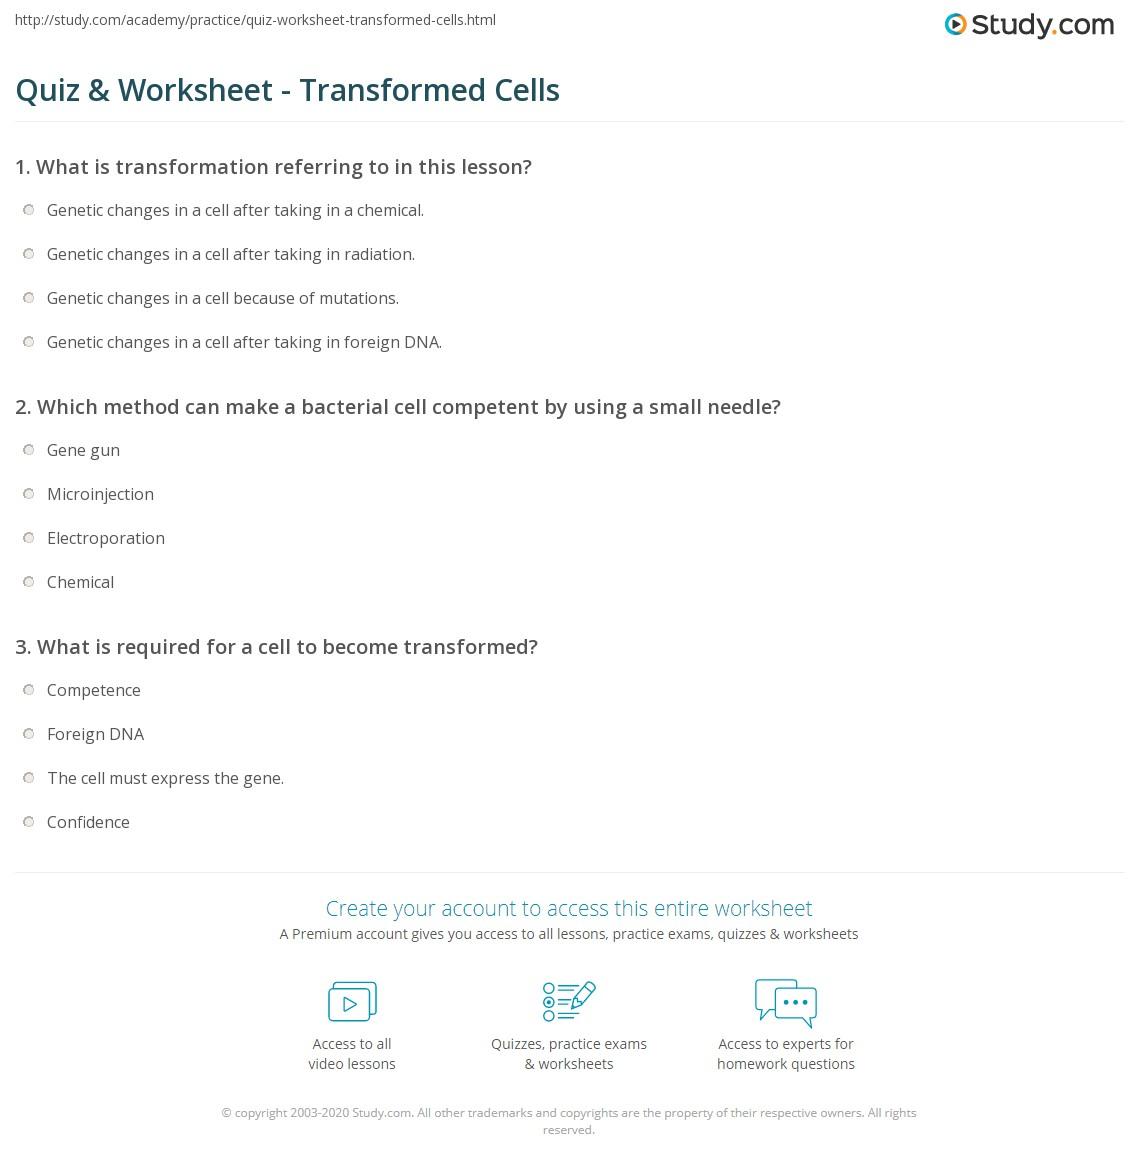 quiz & worksheet - transformed cells | study